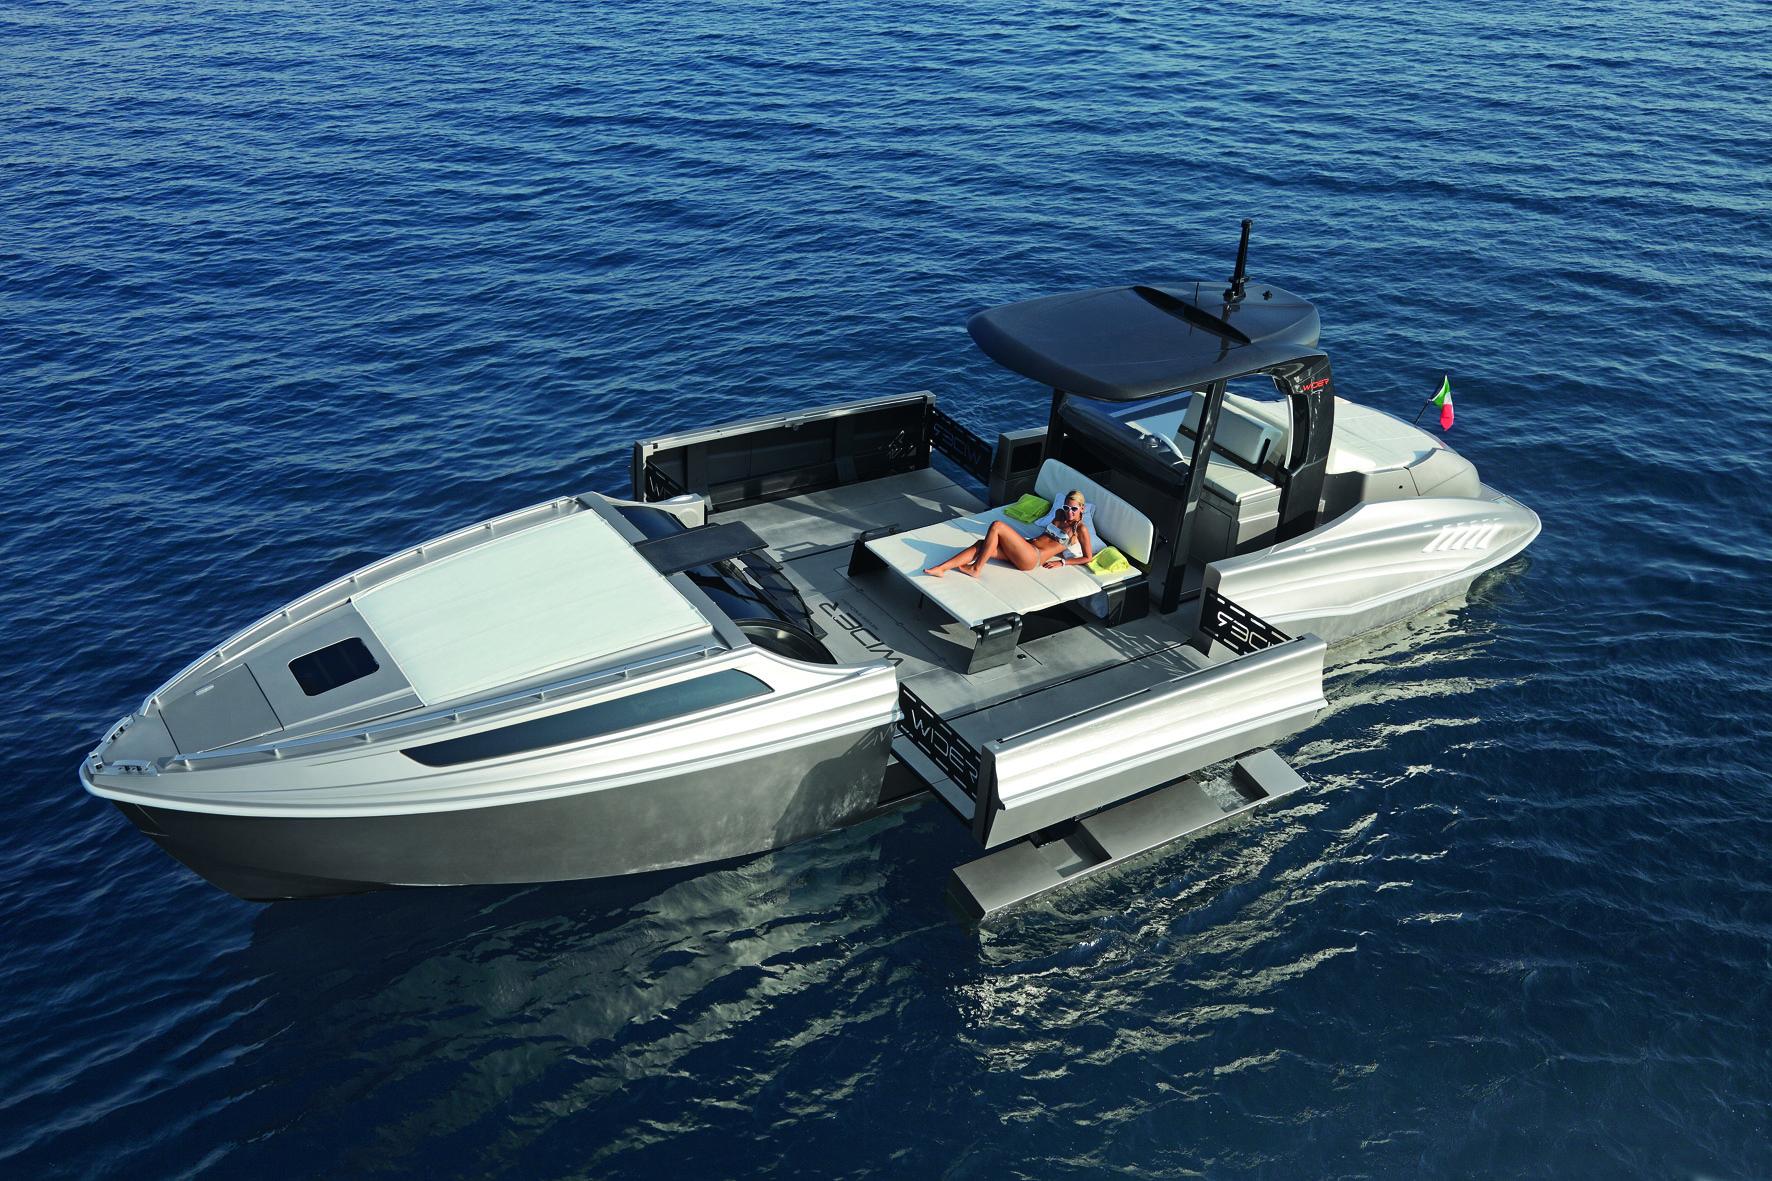 Wider Yachts USA — Yacht Charter & Superyacht News